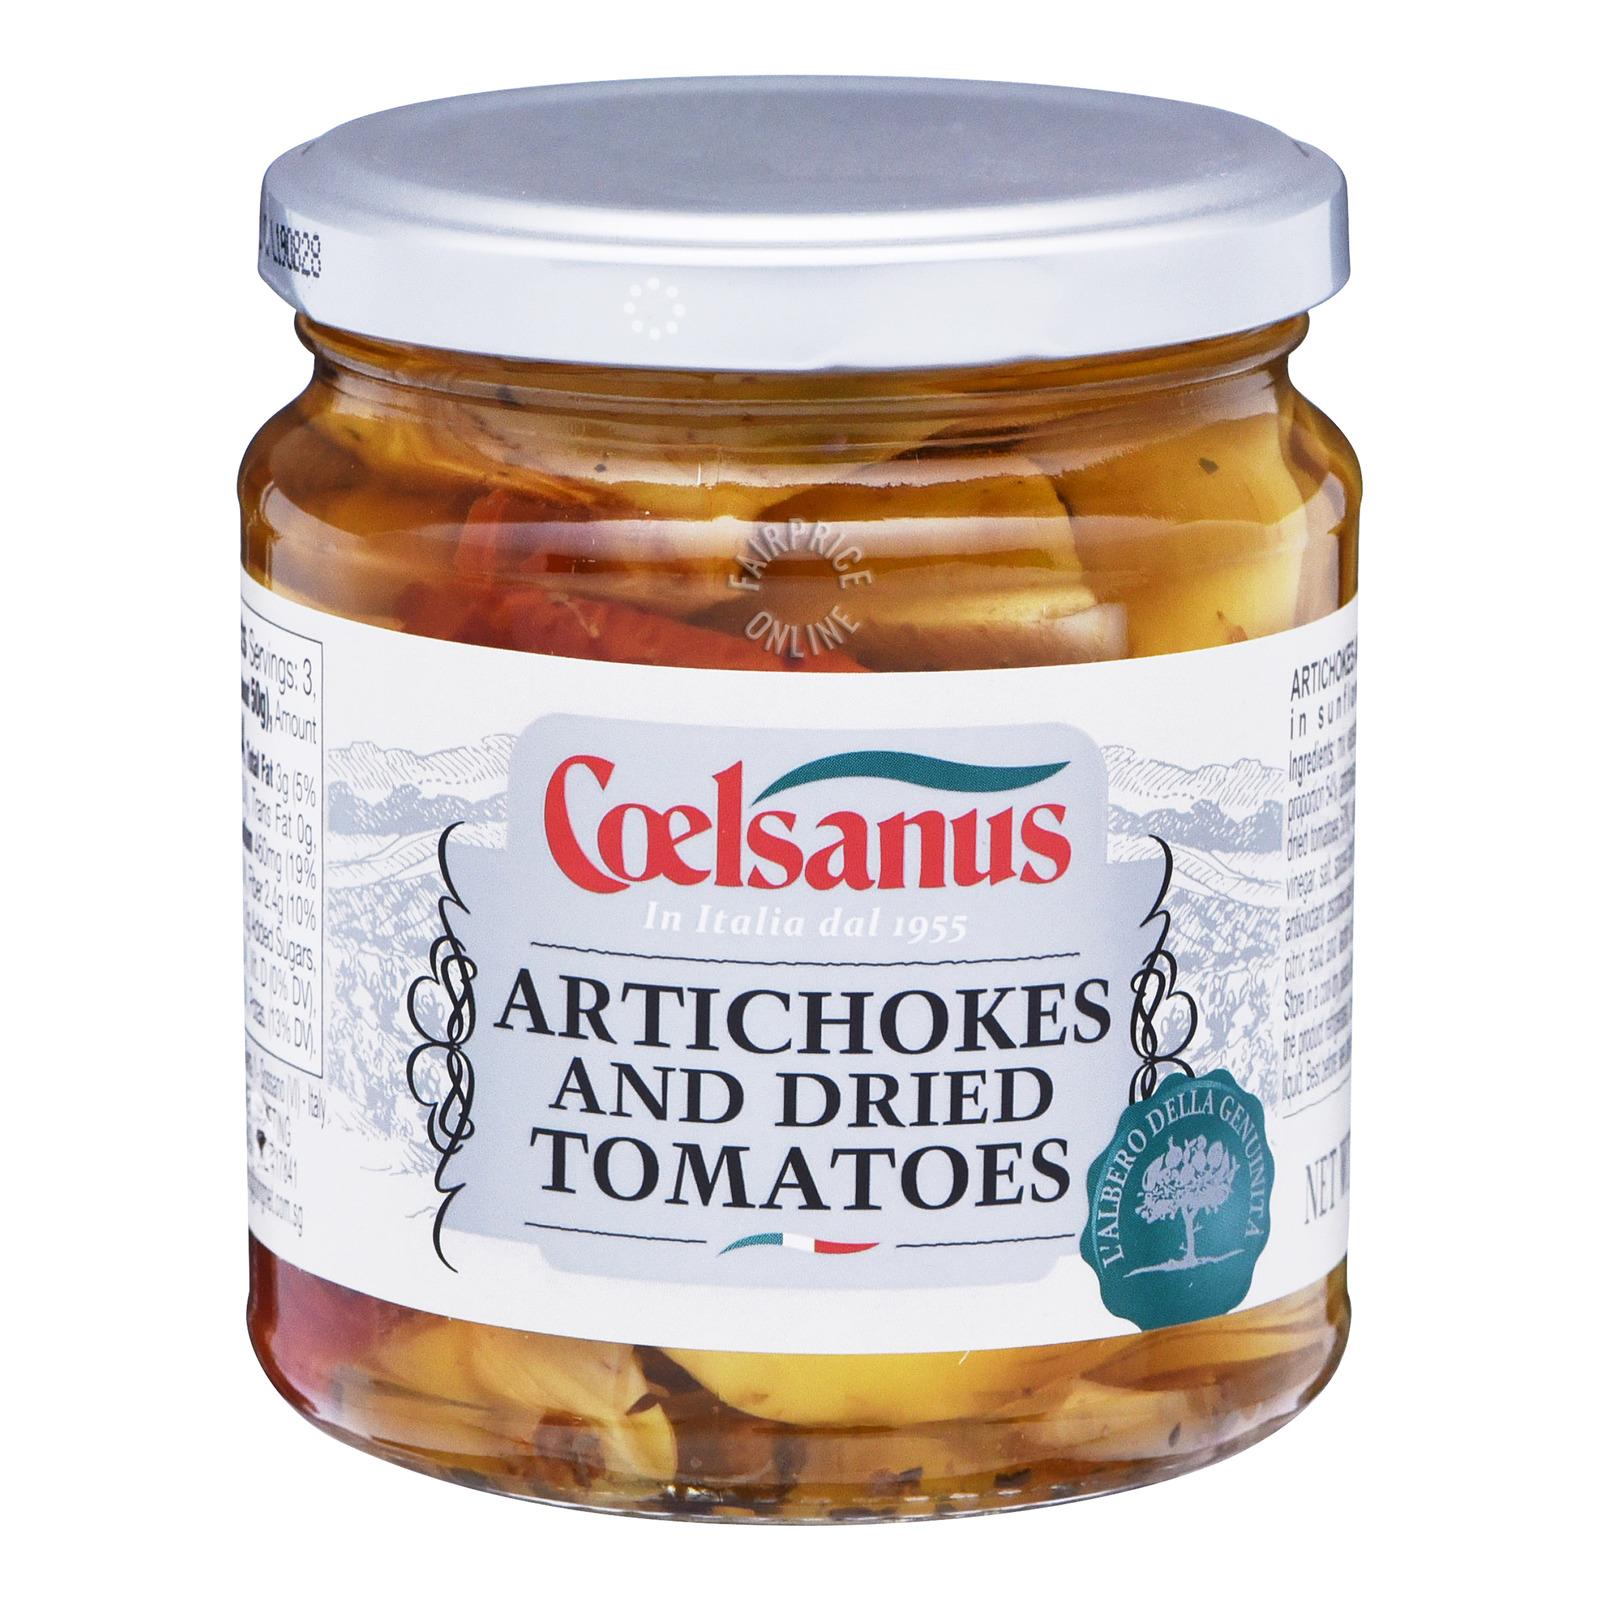 Colesanus Dried Tomatoes in Sunflower Oil - Artichokes